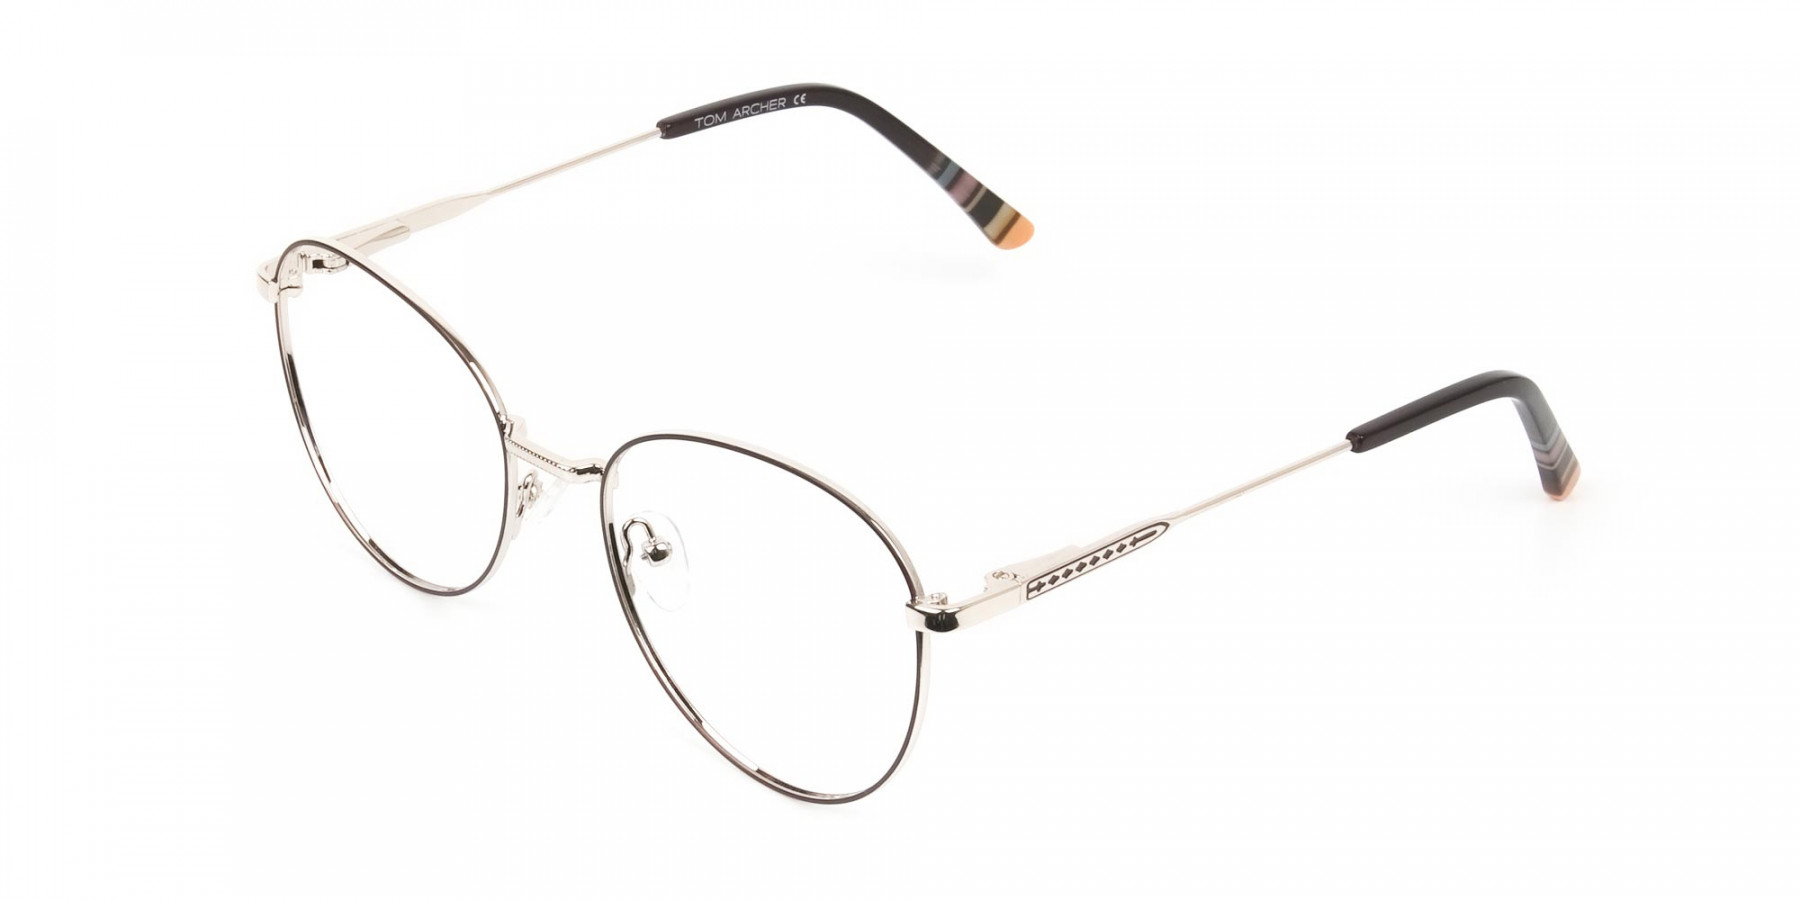 Brown & Gold Weightless Round Glasses - 1